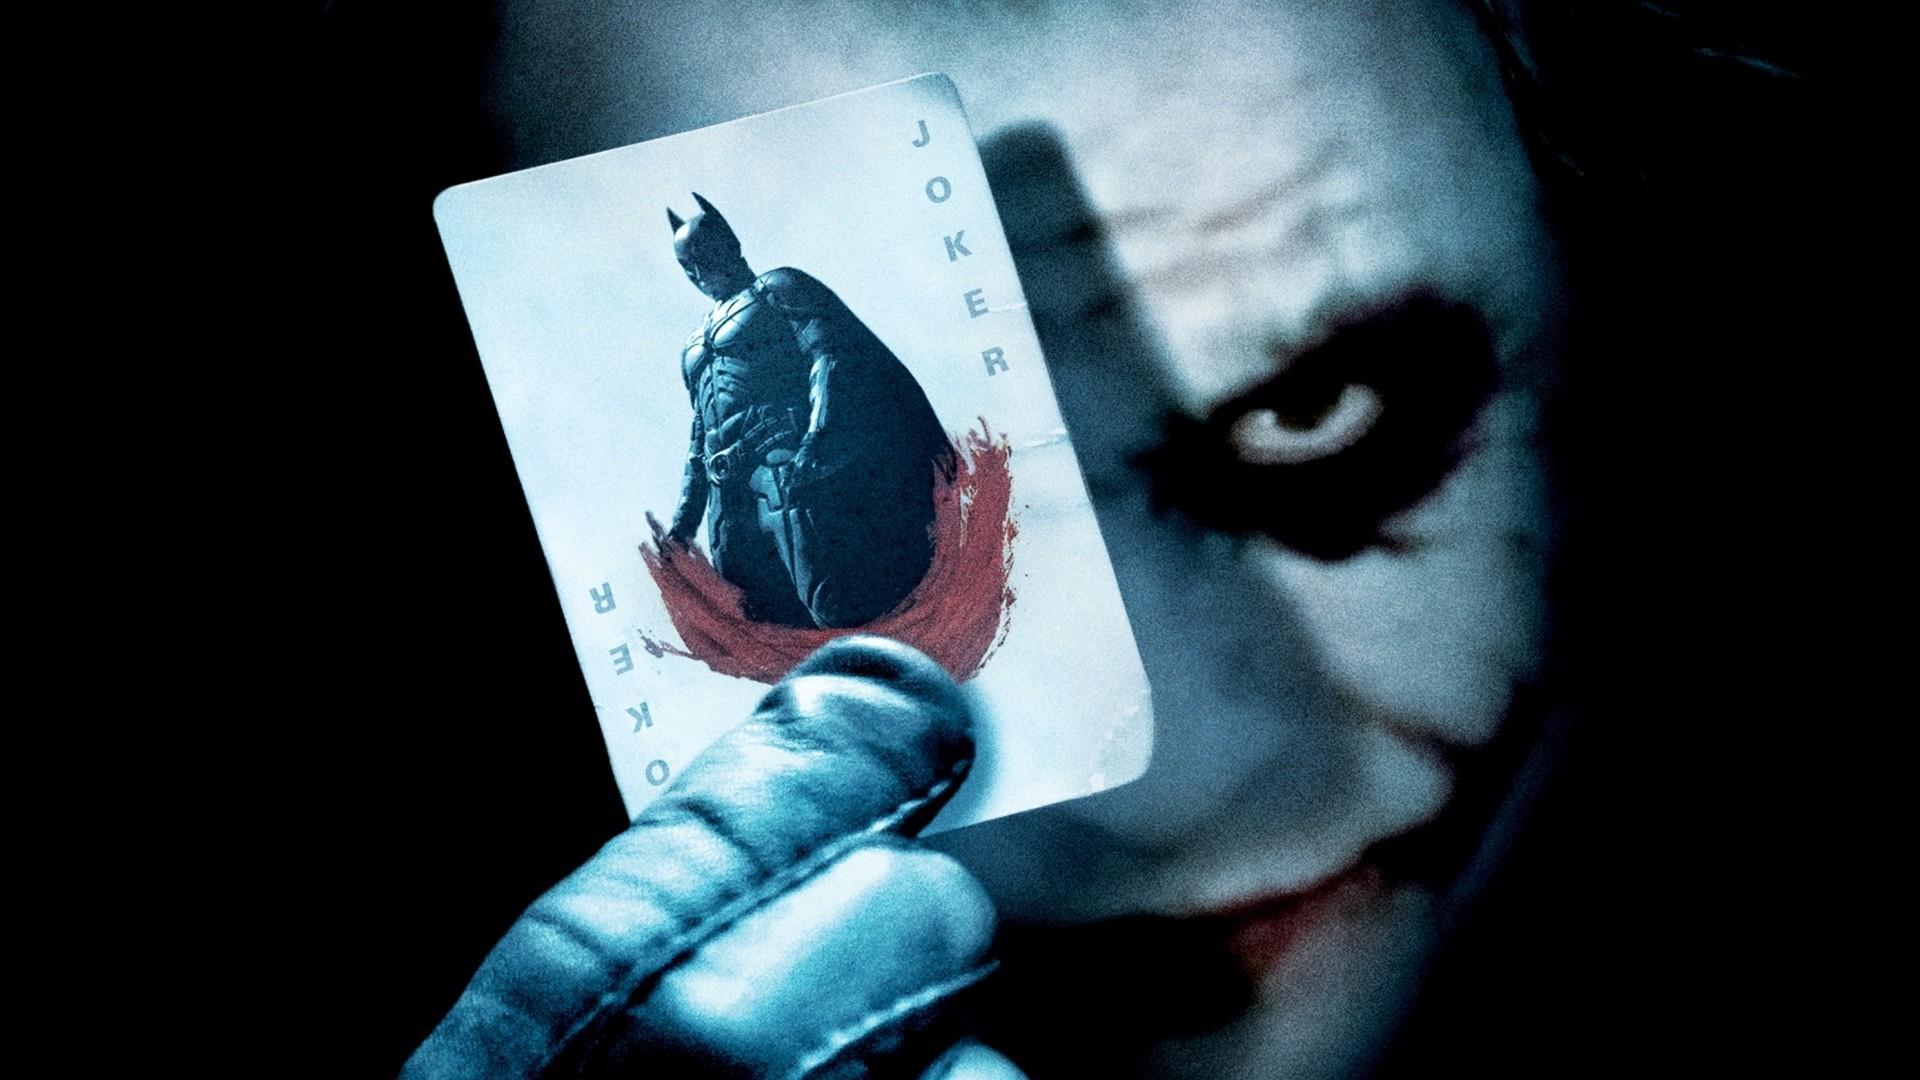 Hd wallpaper of joker - Batman Joker Card Wallpapers Hd Wallpapers